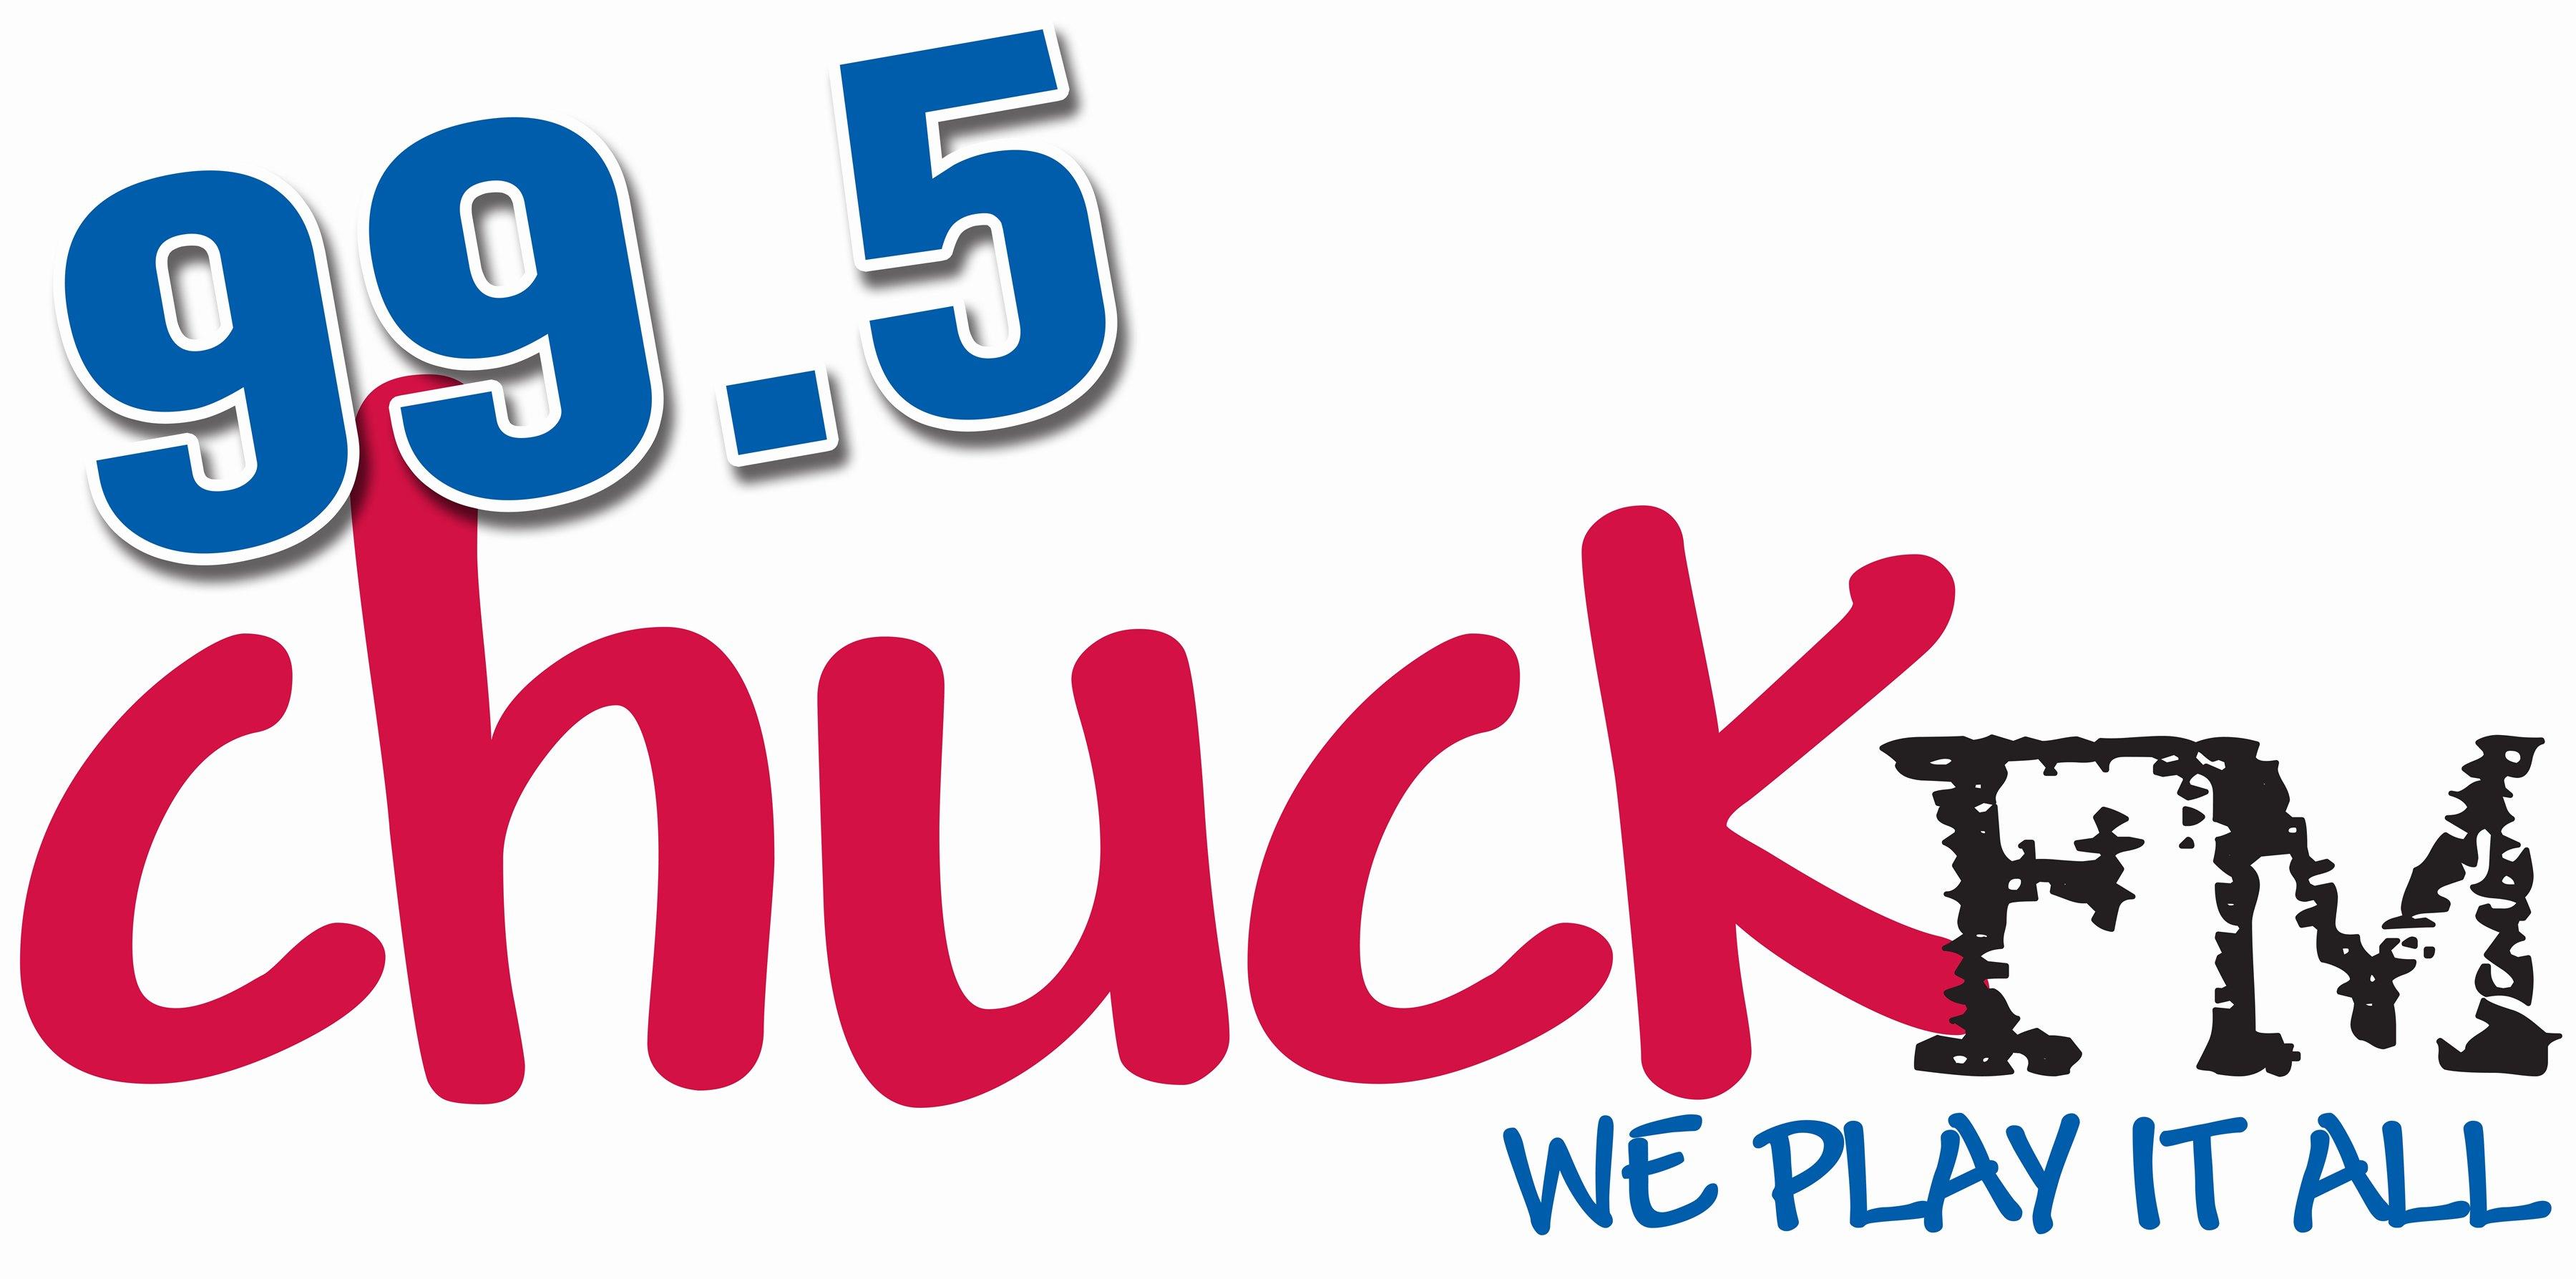 99.5 Chuck FM